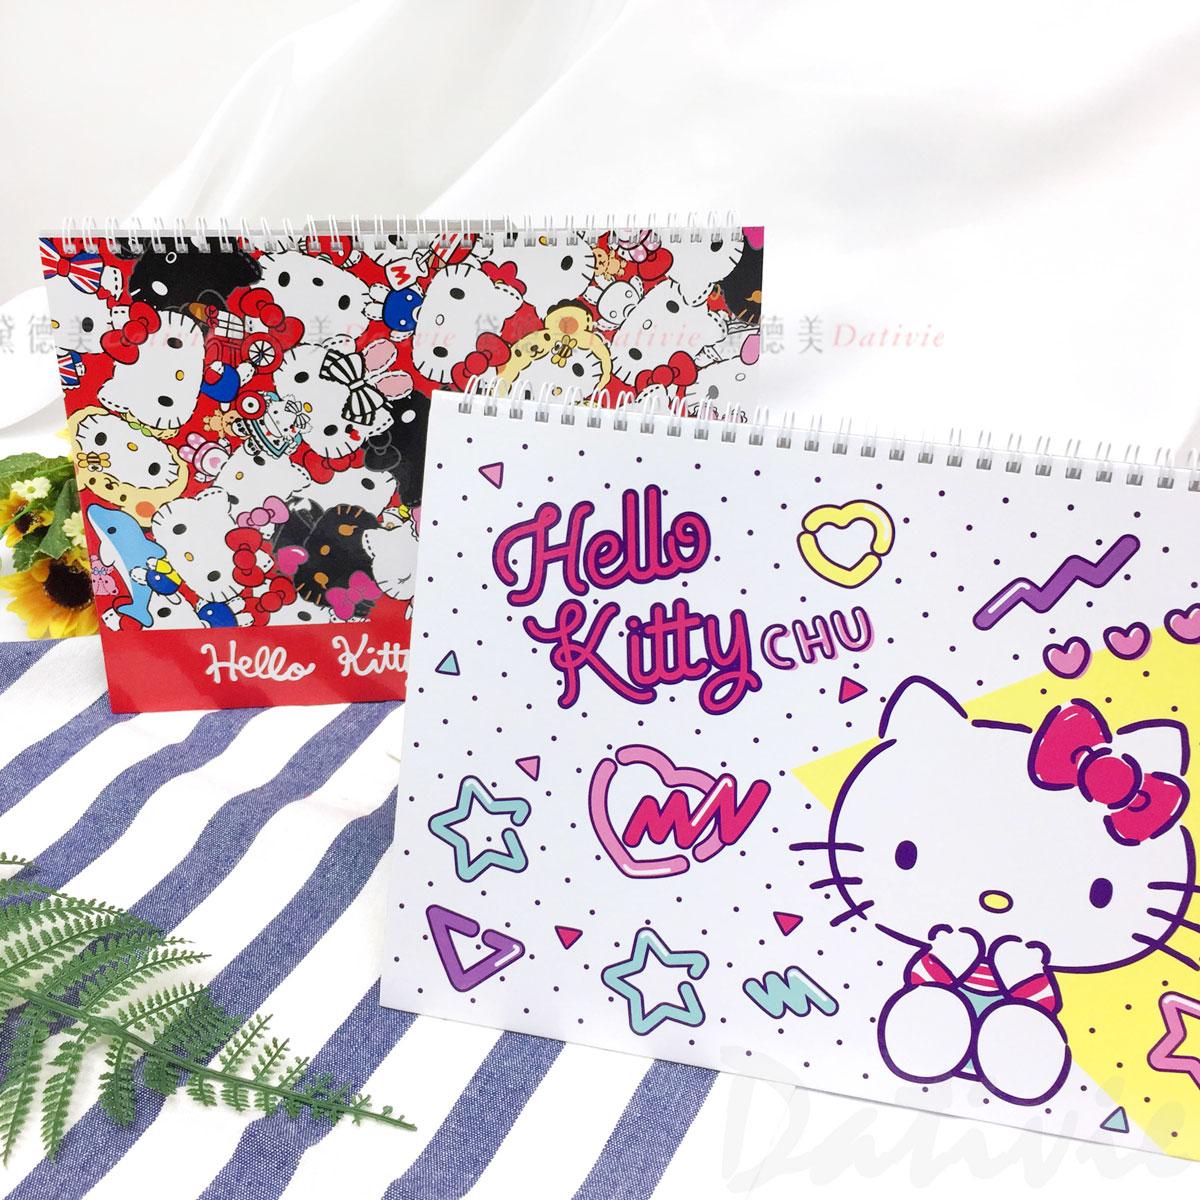 13K 寫寫畫畫擦擦本 凱蒂貓 HELLO KITTY 三麗鷗 Sanrio 空白本 正版授權